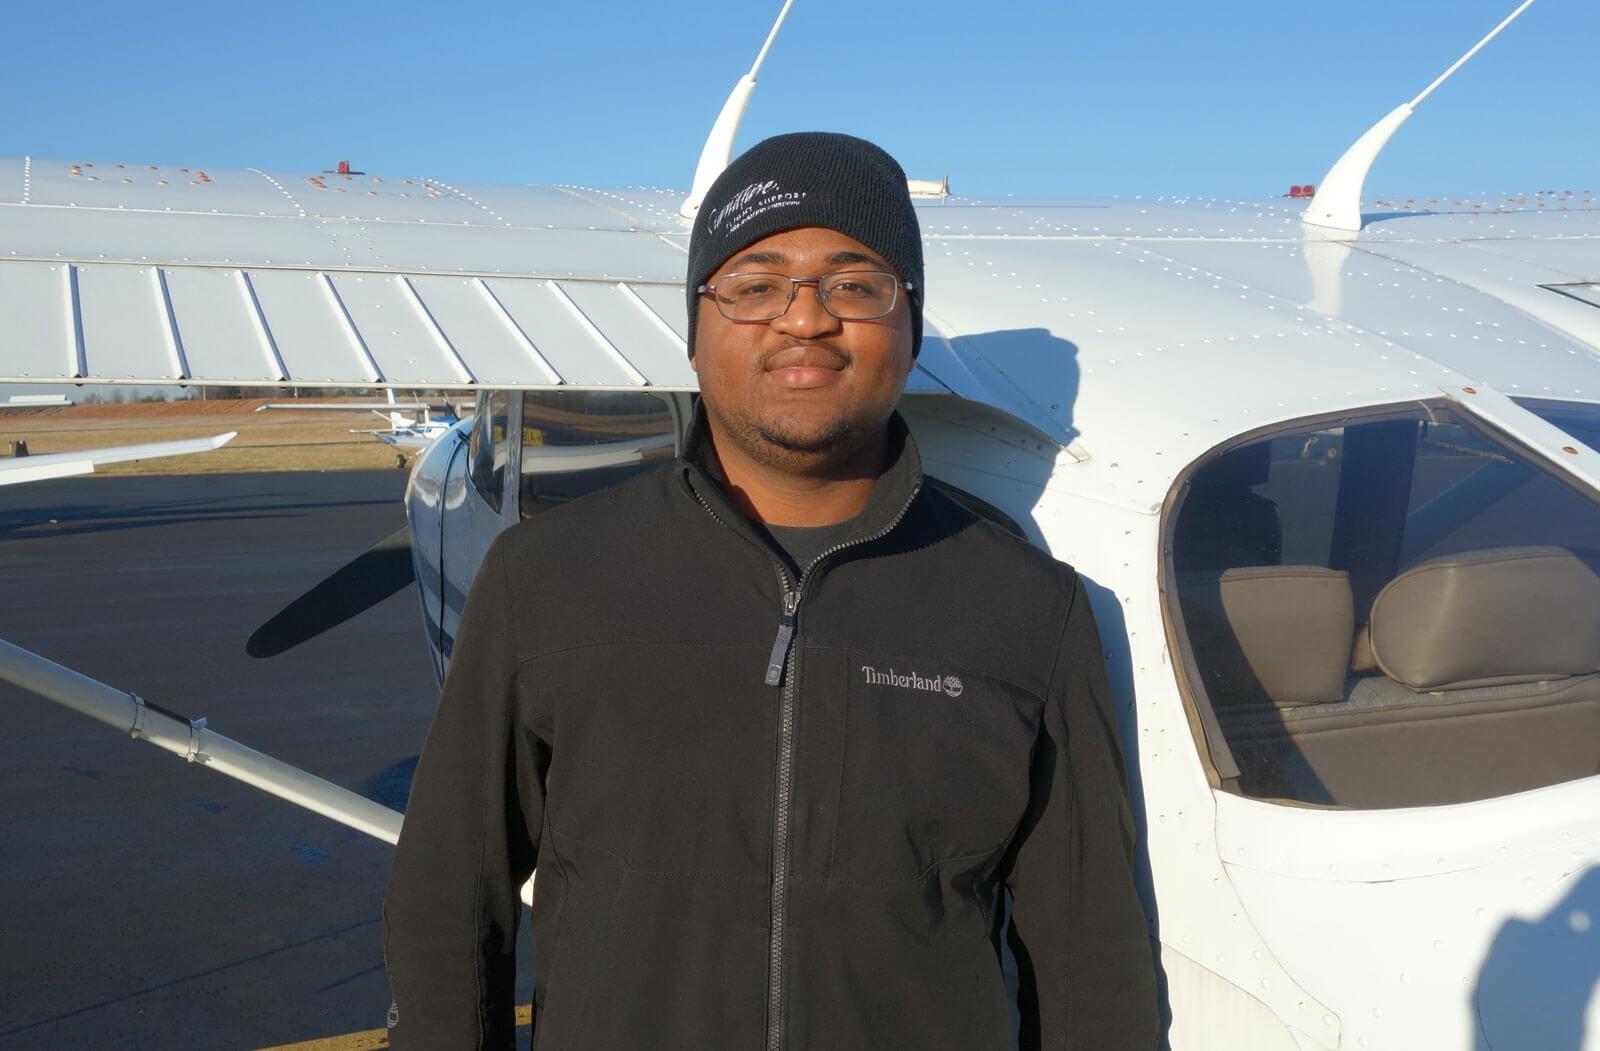 Elijah Johnson, CFI, Princeton Flying School